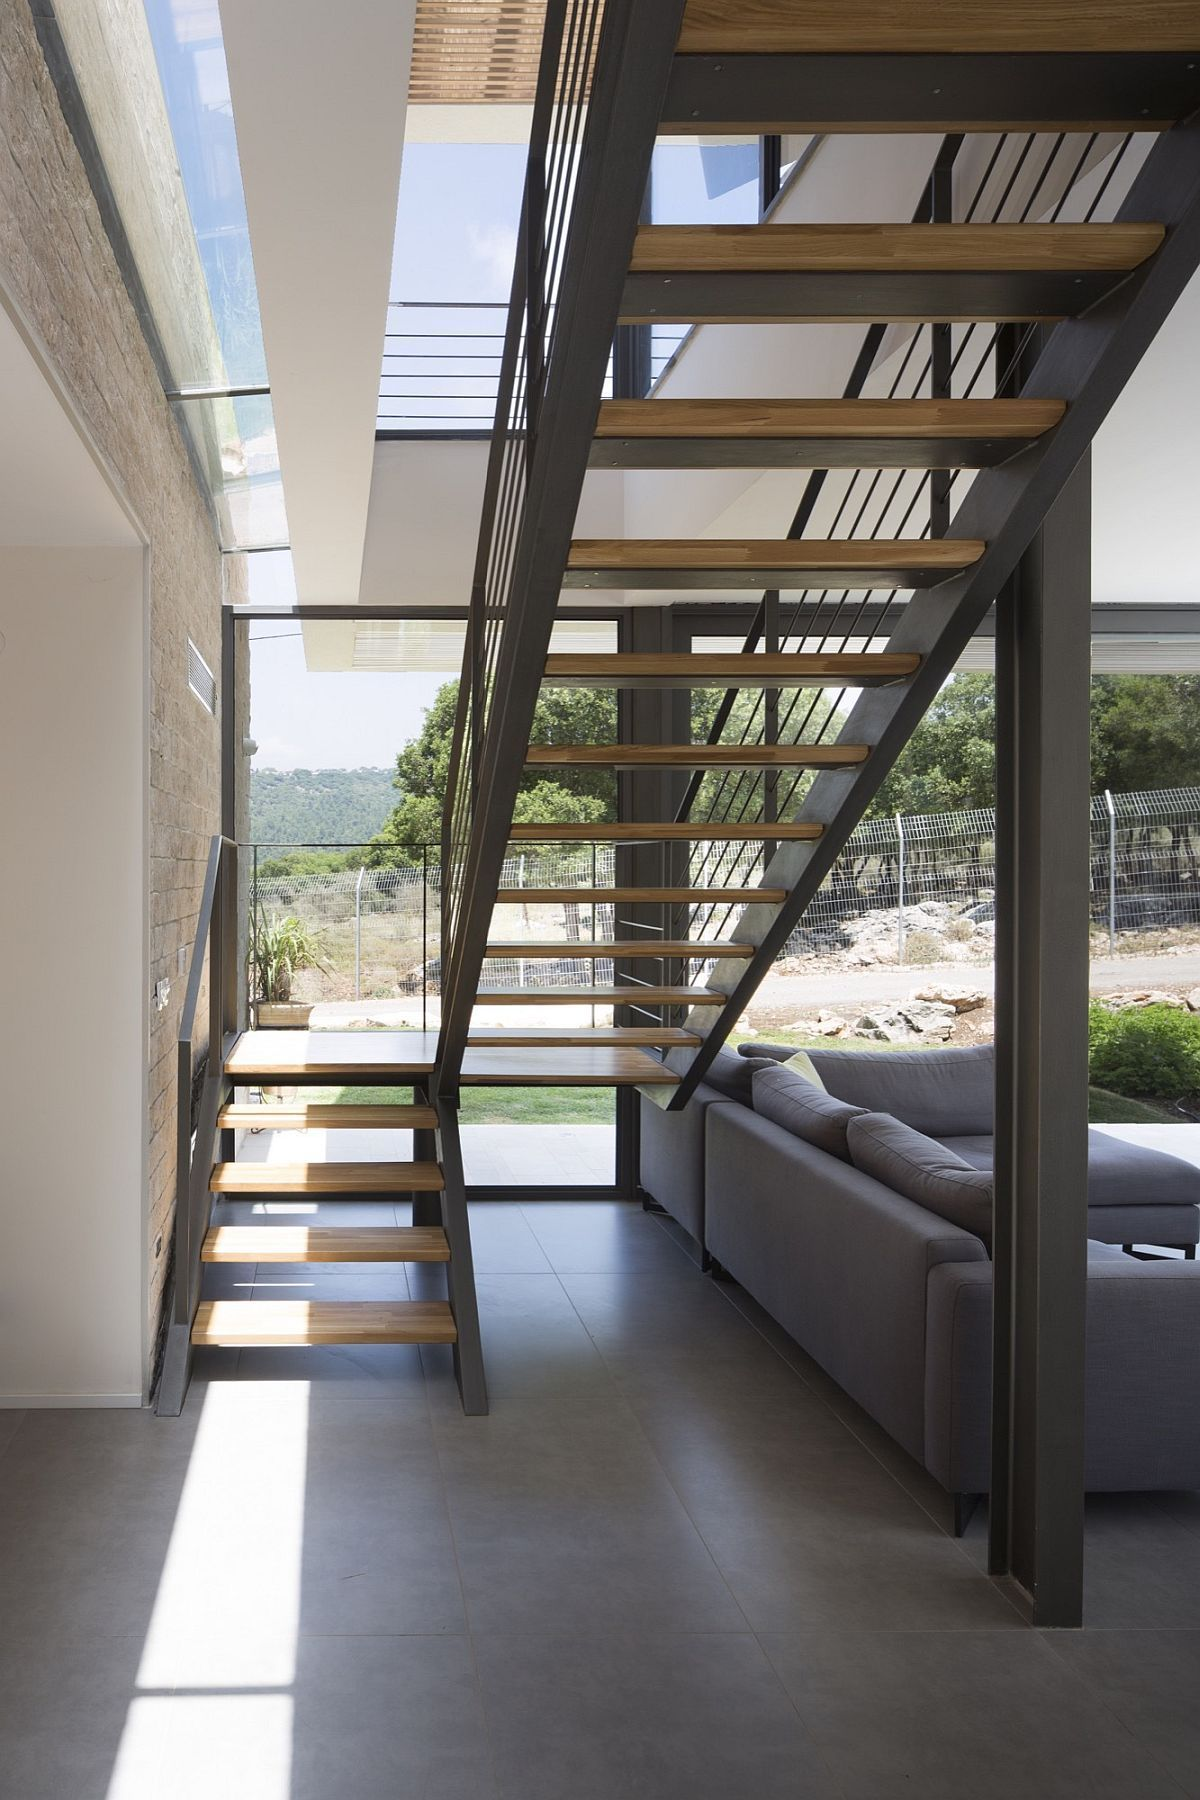 Metallic staircase gives the interior an edgy contemporary